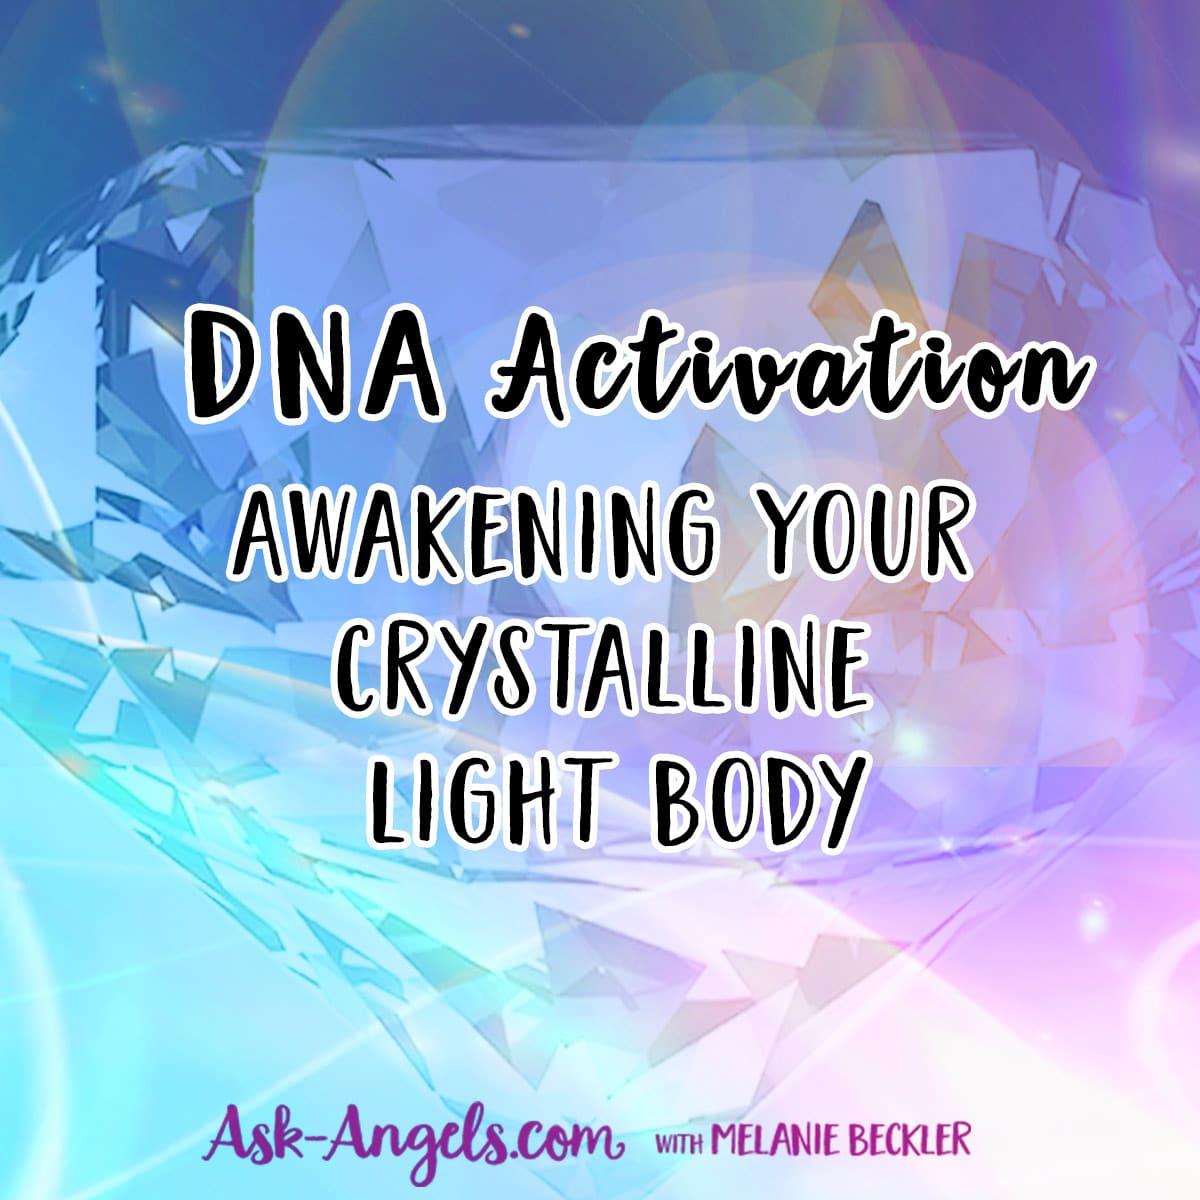 DNA Activation Course